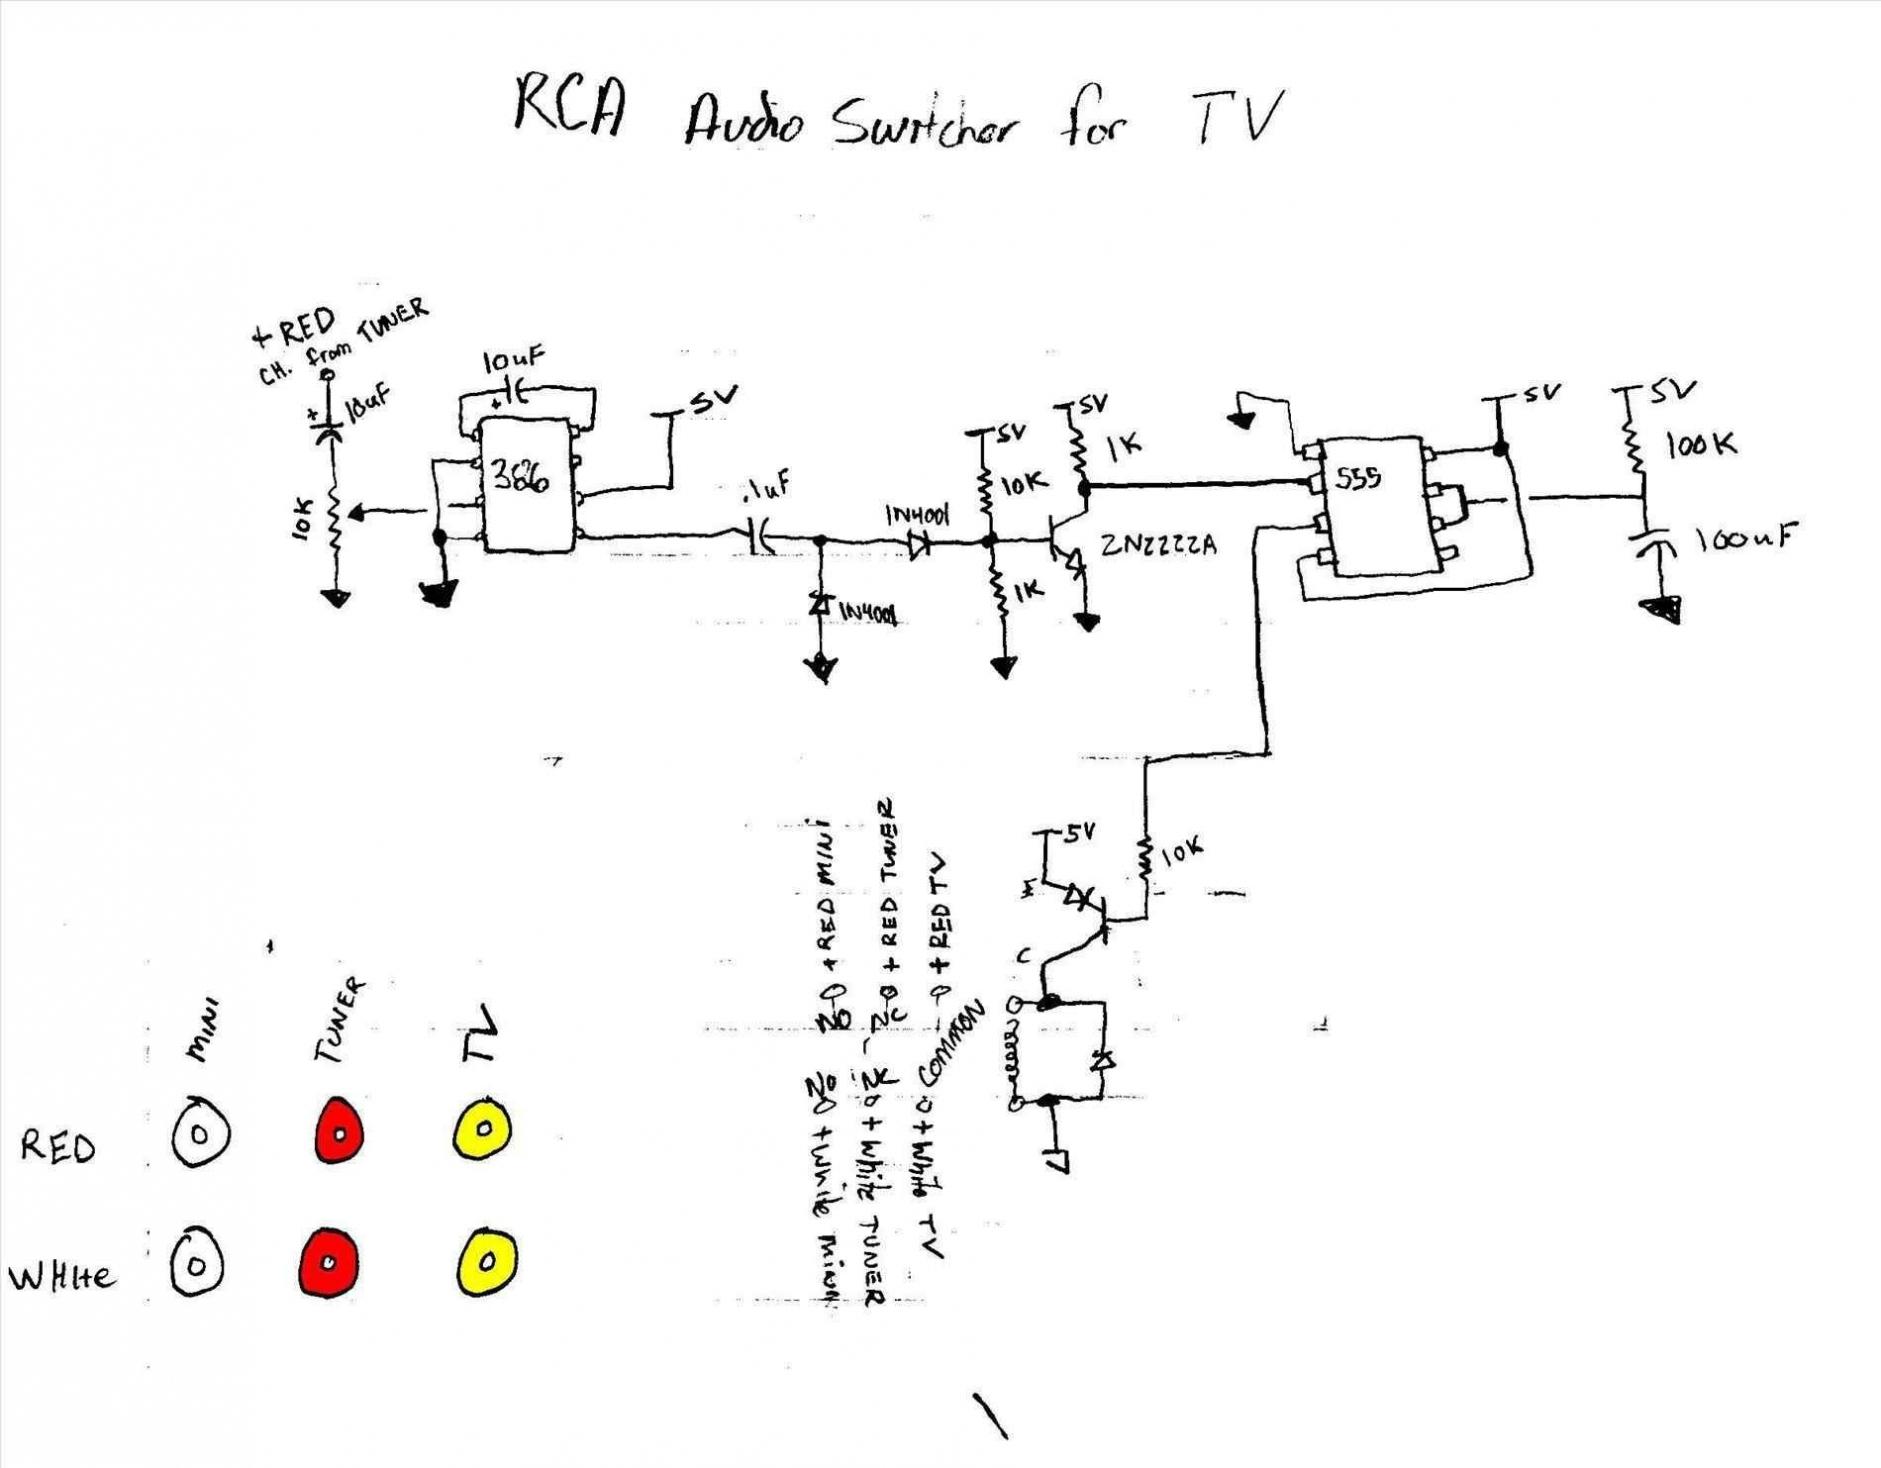 Mini Hdmi Cable Wiring Diagram Best Micro Hdmi Cable Wiring Diagram - Rca Wiring Diagram